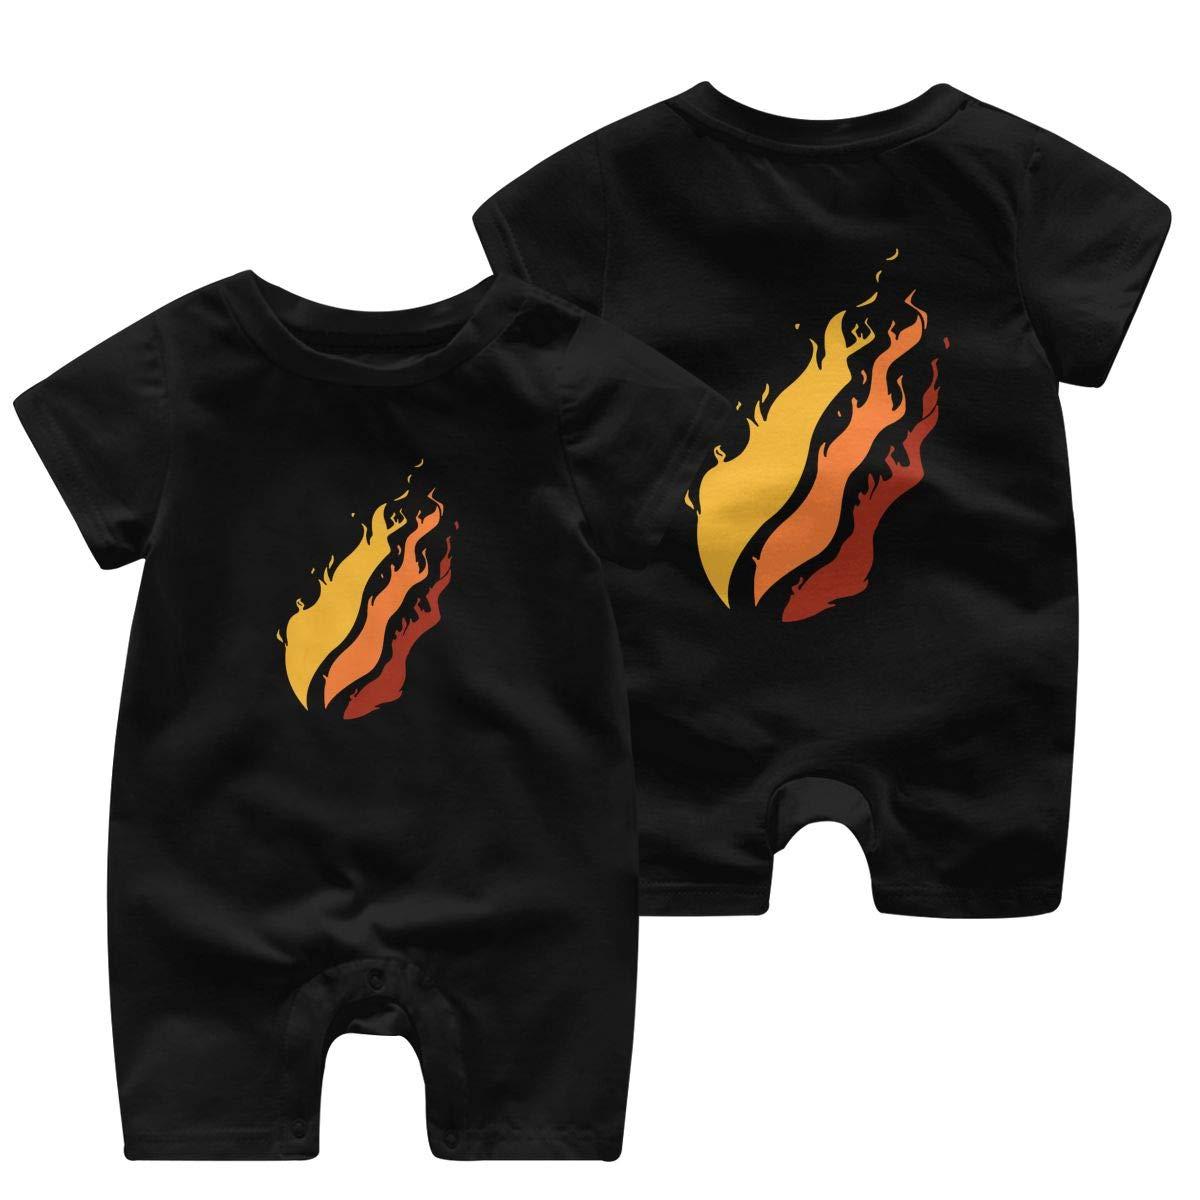 HGJLTY Preston Playz Baby Jumpsuit Boys Girls 100/% Cotton Short Sleeve Rompers Double Print